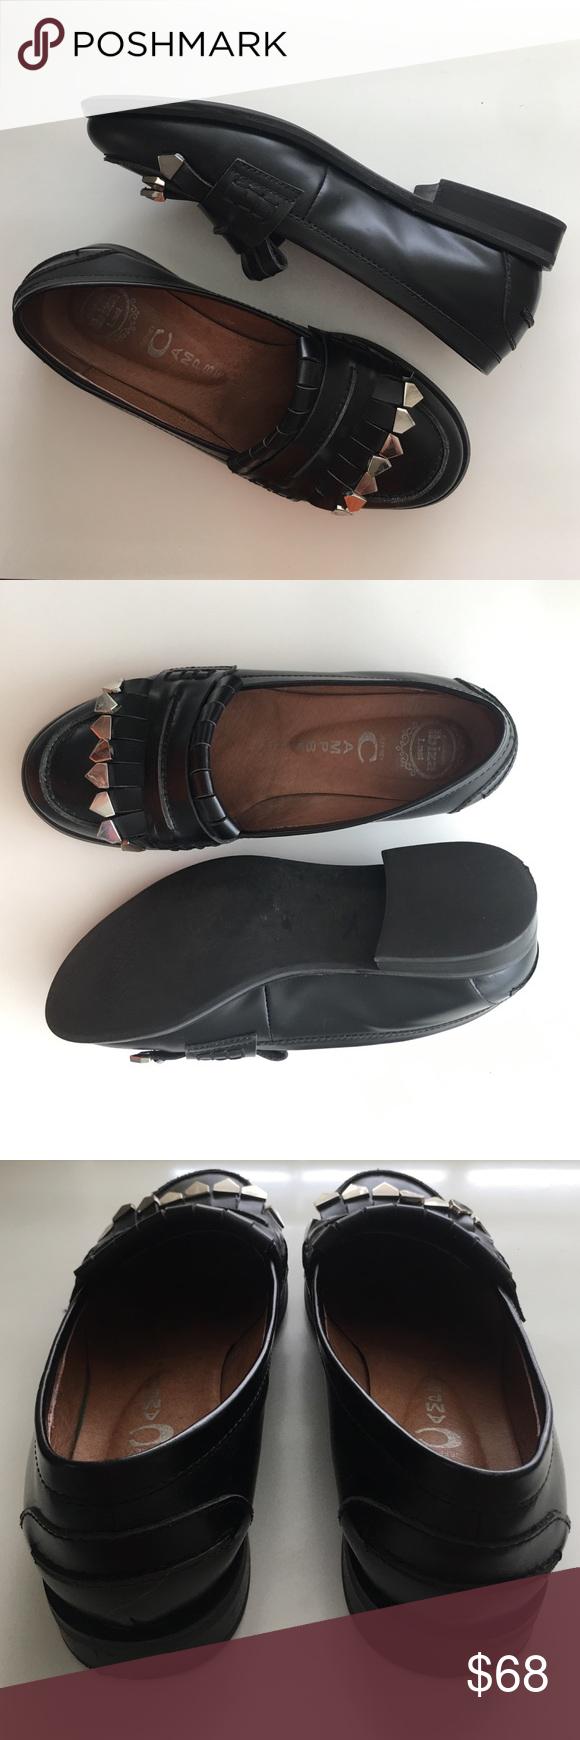 Jeffrey Campbell Silver Tassel Loafers Excellent Condition! Super comfy. Jeffrey Campbell Loafers with silver Tassels Jeffrey Campbell Shoes